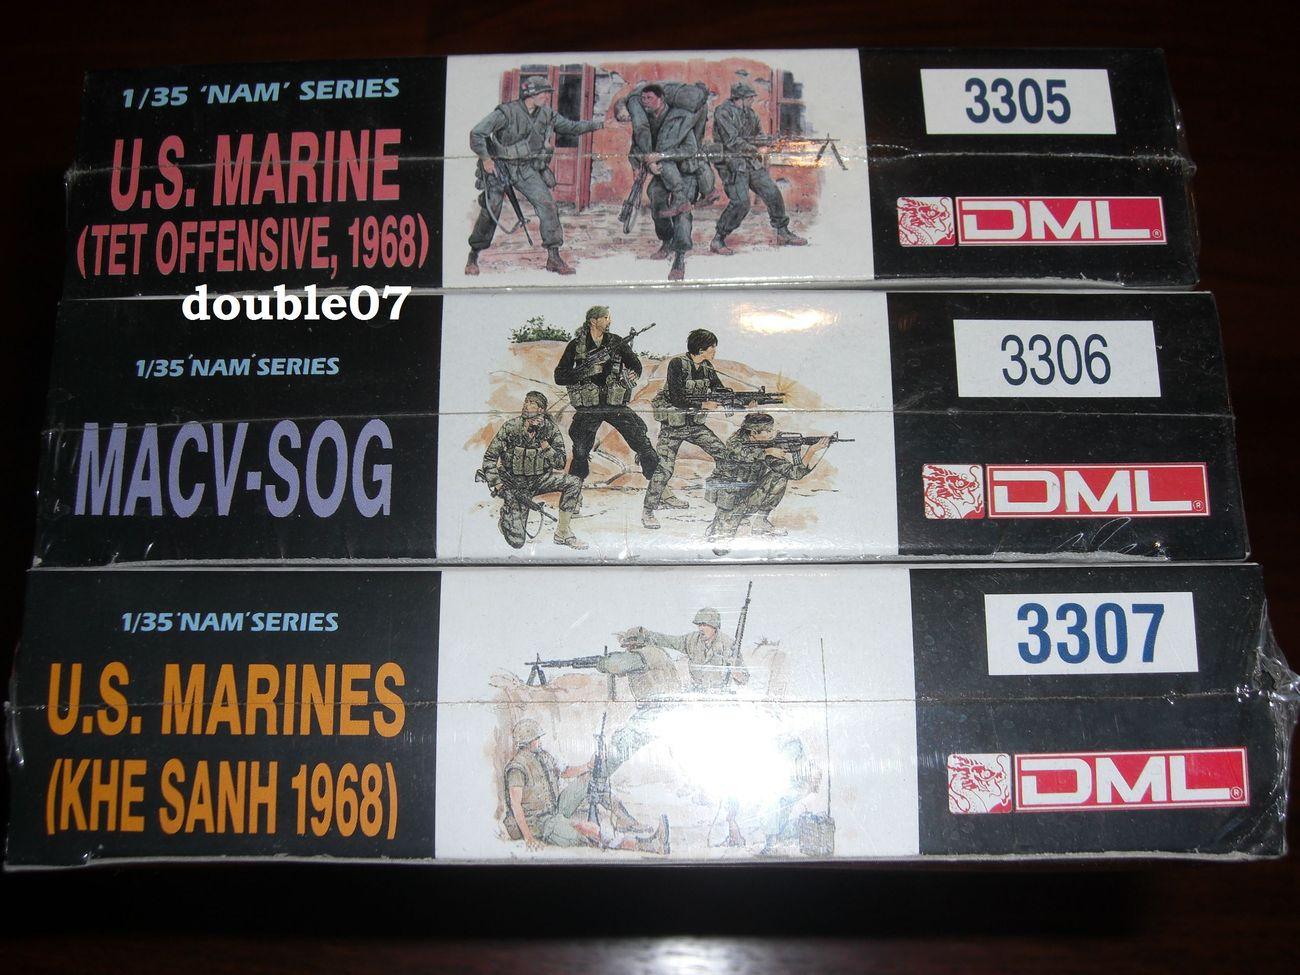 DML 1/35 'Nam' Series IN SHRINK WRAP 3305 3306 3307 (lot of 3)